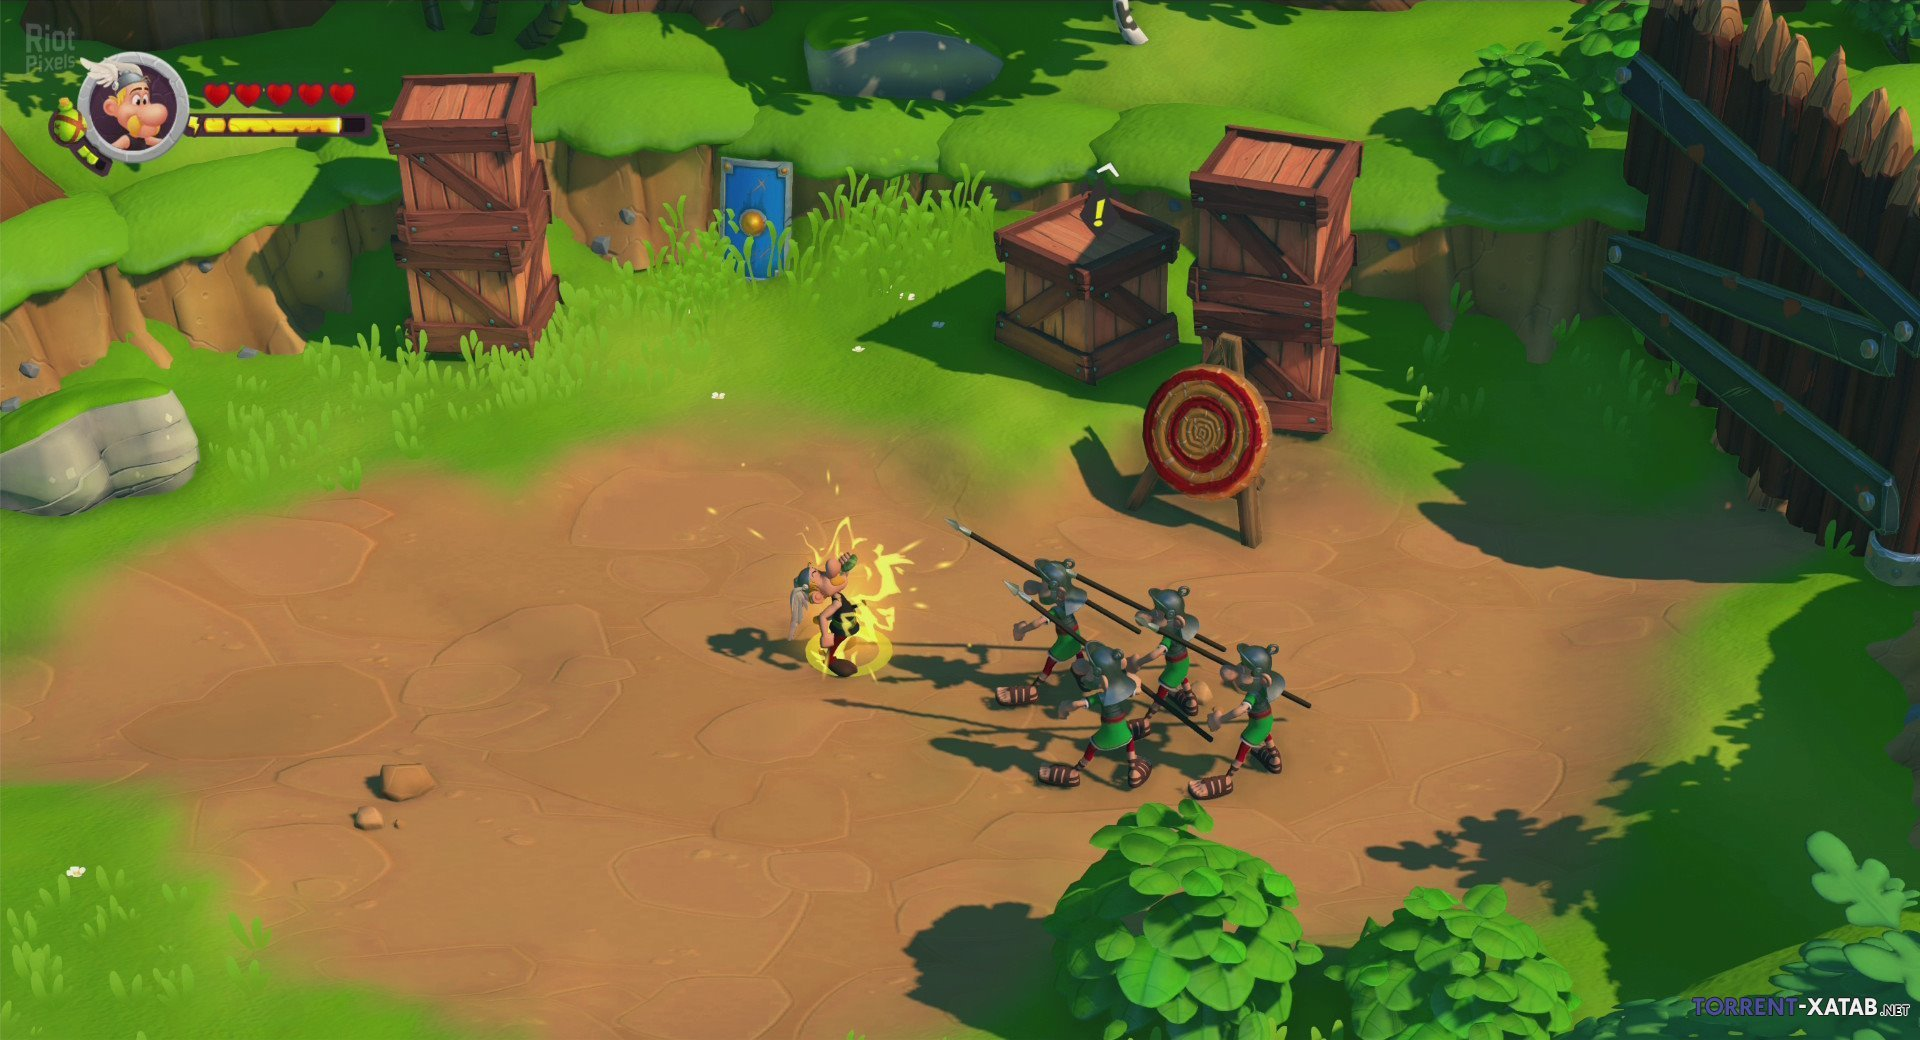 Скриншот к игре Asterix & Obelix XXL 3 - The Crystal Menhir